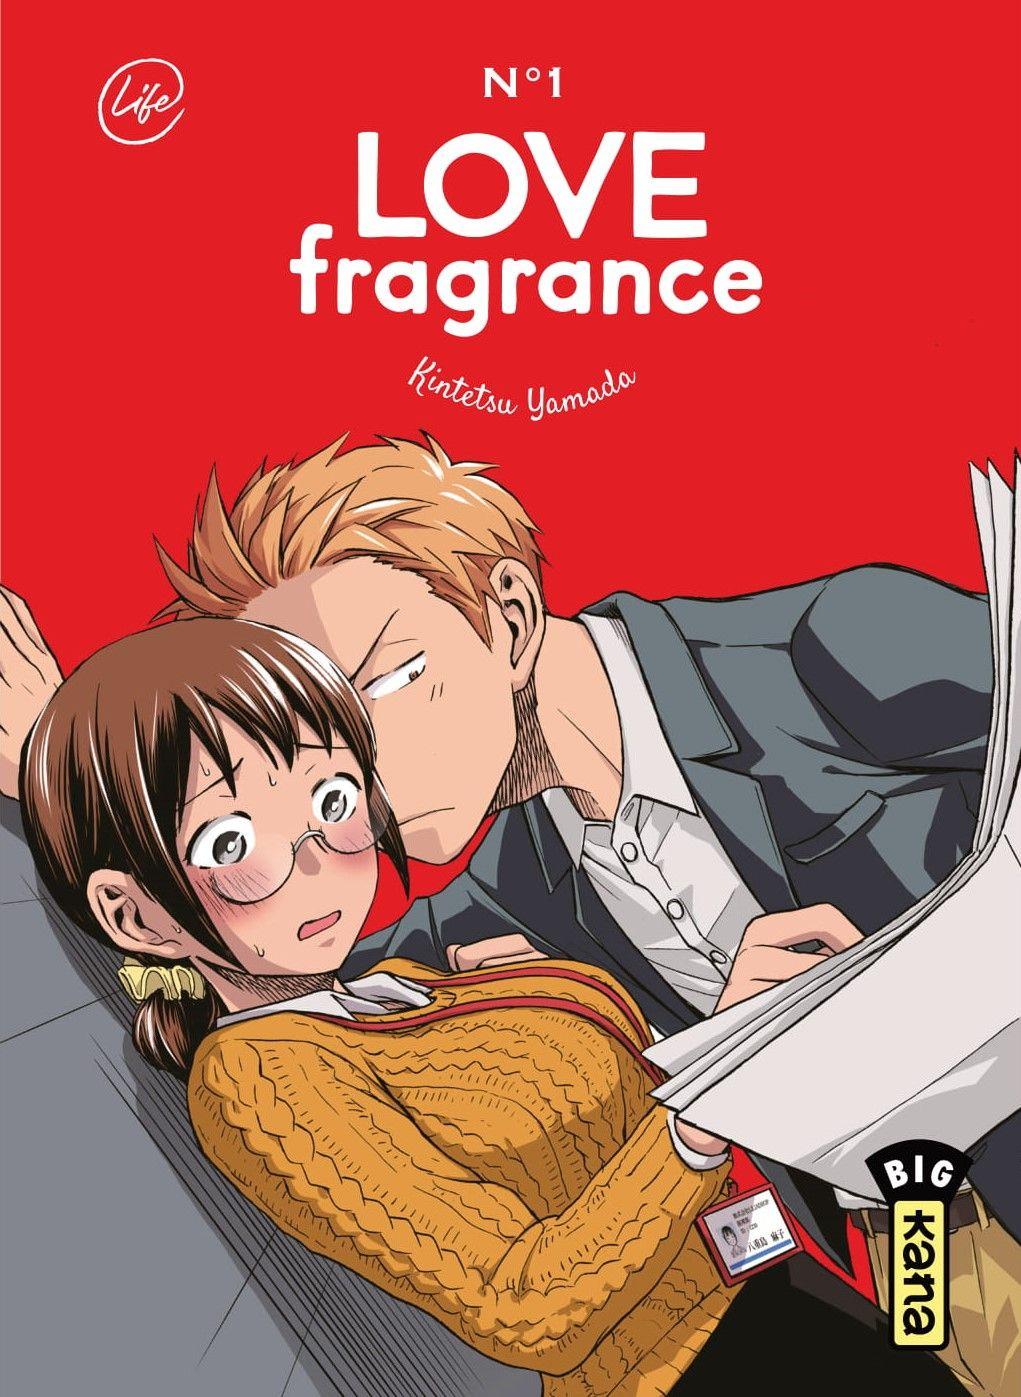 Love fragrance kana life